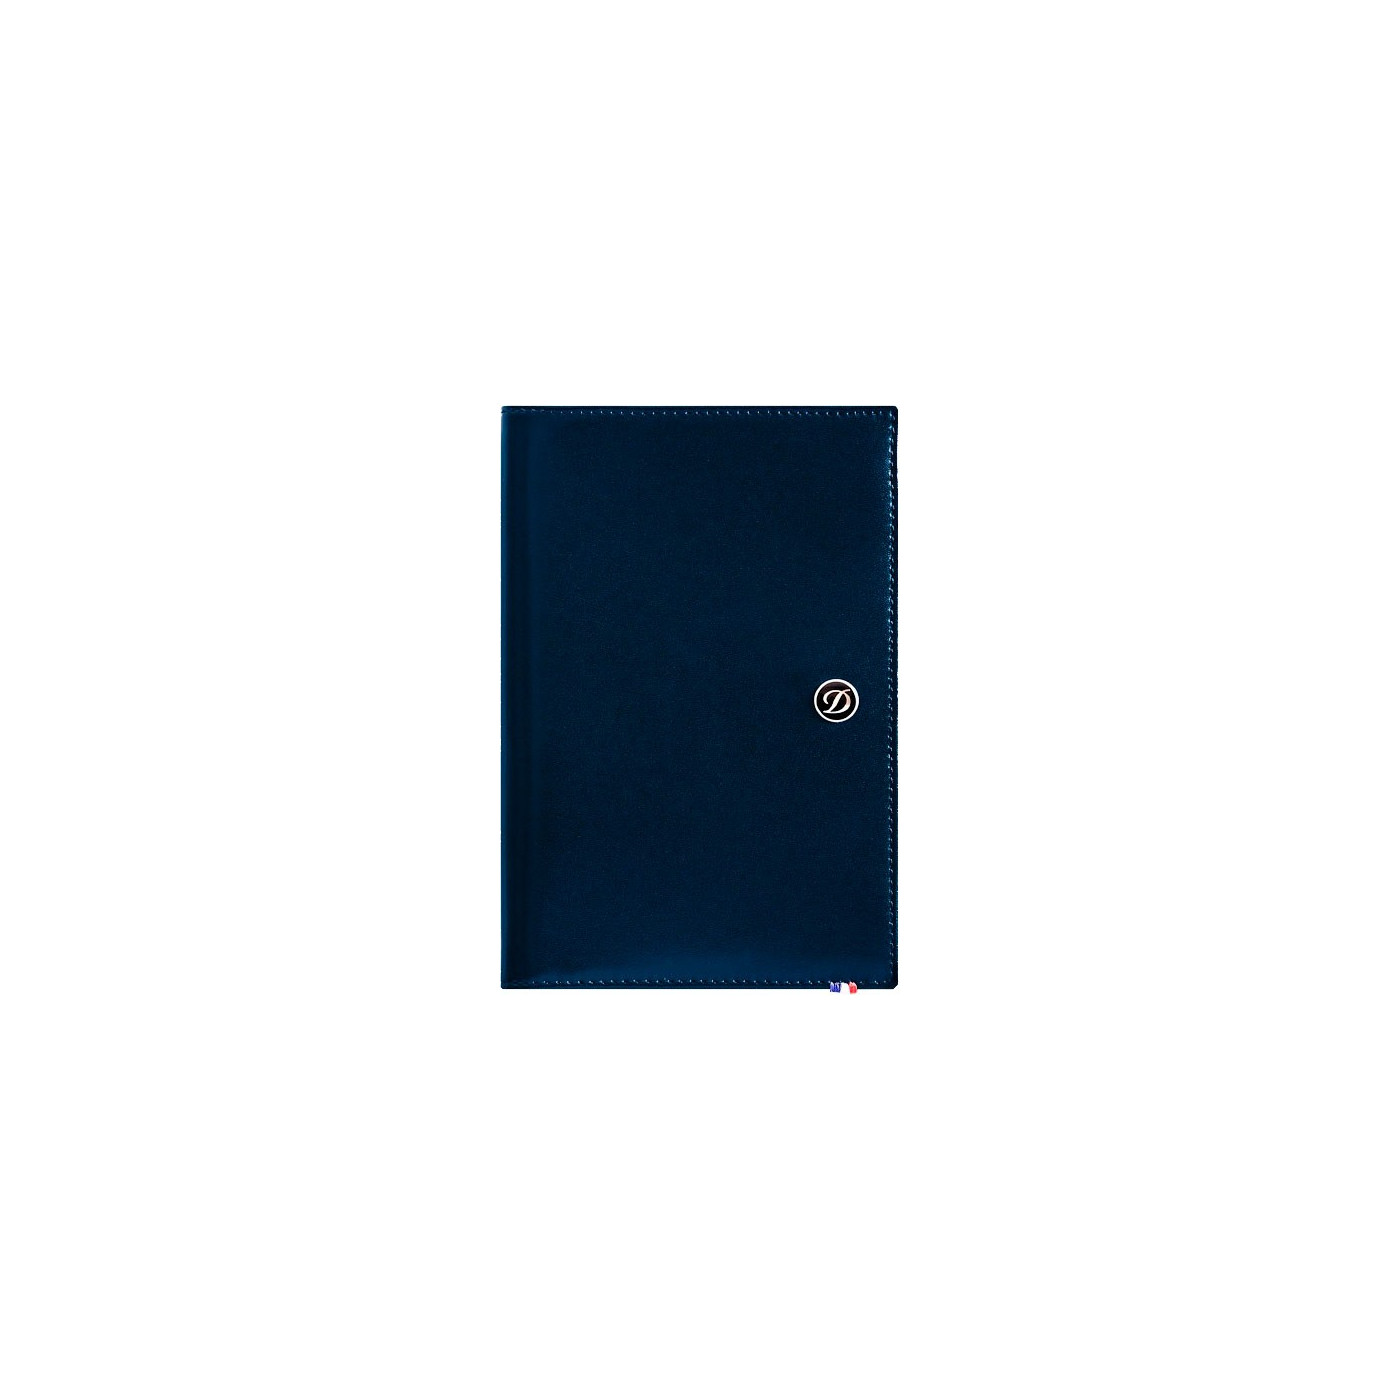 Dupont 180912 Обложка дпаспорта